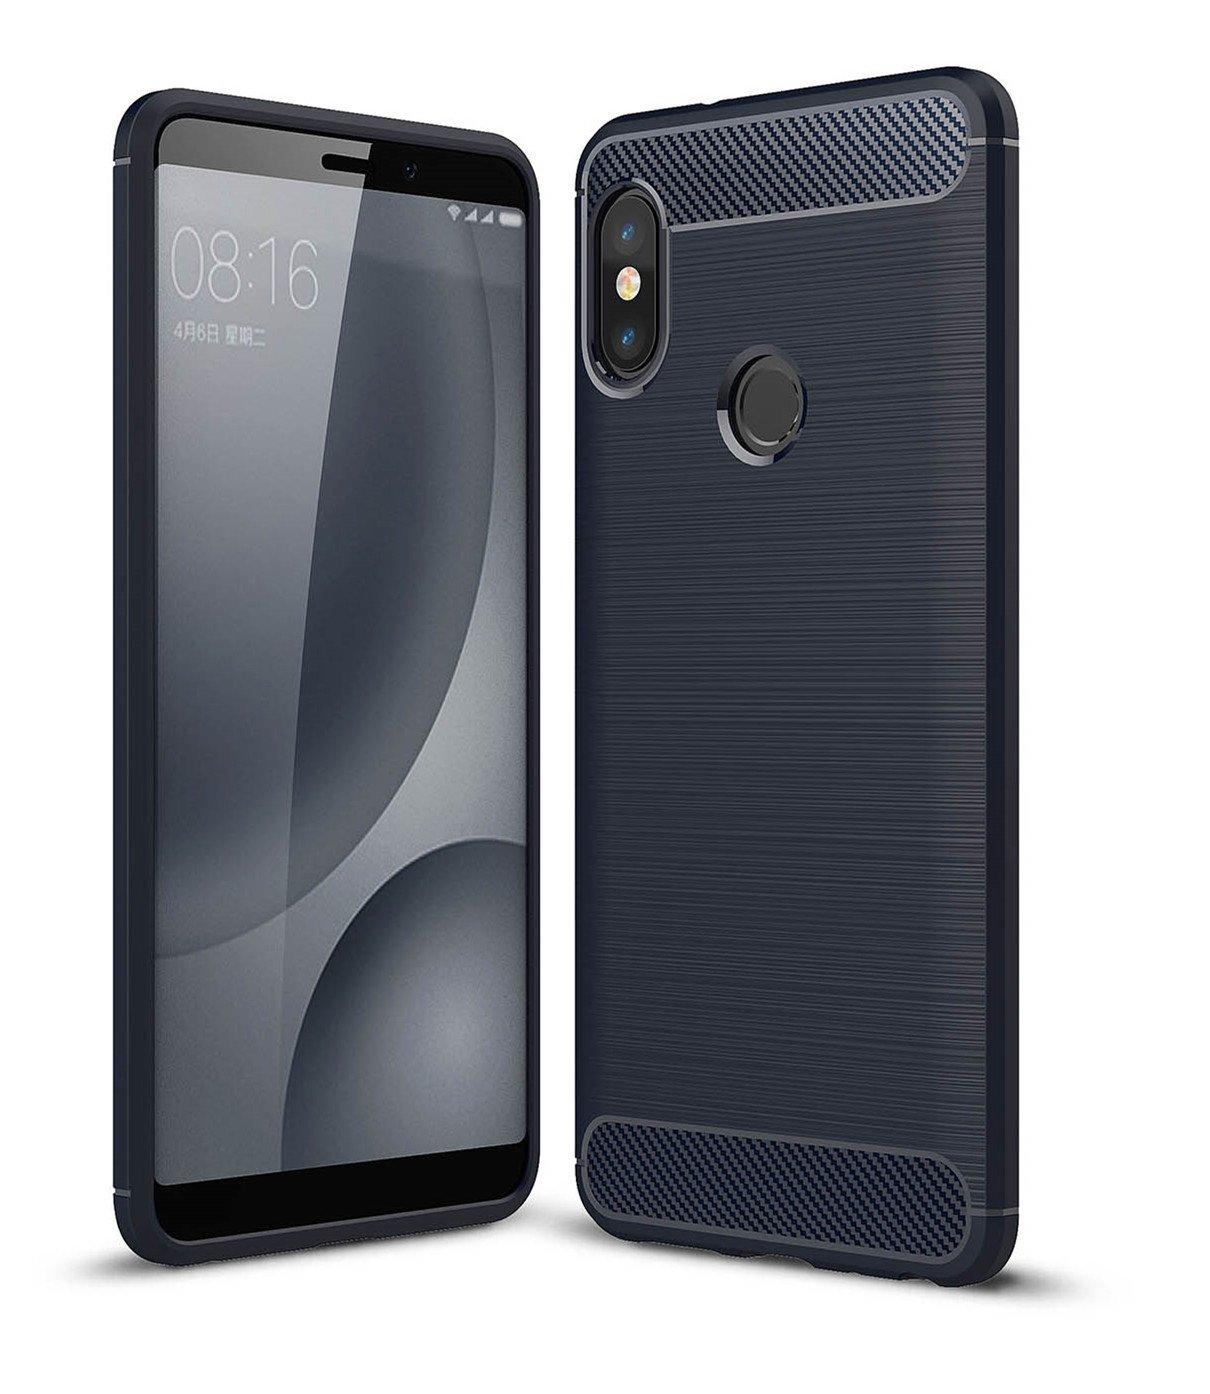 SPAK Xiaomi Mi 6X, Xiaomi redmi Uwagi 5 Pro Case, Ultra Thin ochronna powłoka TPU Silicone Case dla Xiaomi Mi 6X, Xiaomi redmi Uwagi 5 Pro (niebieski)